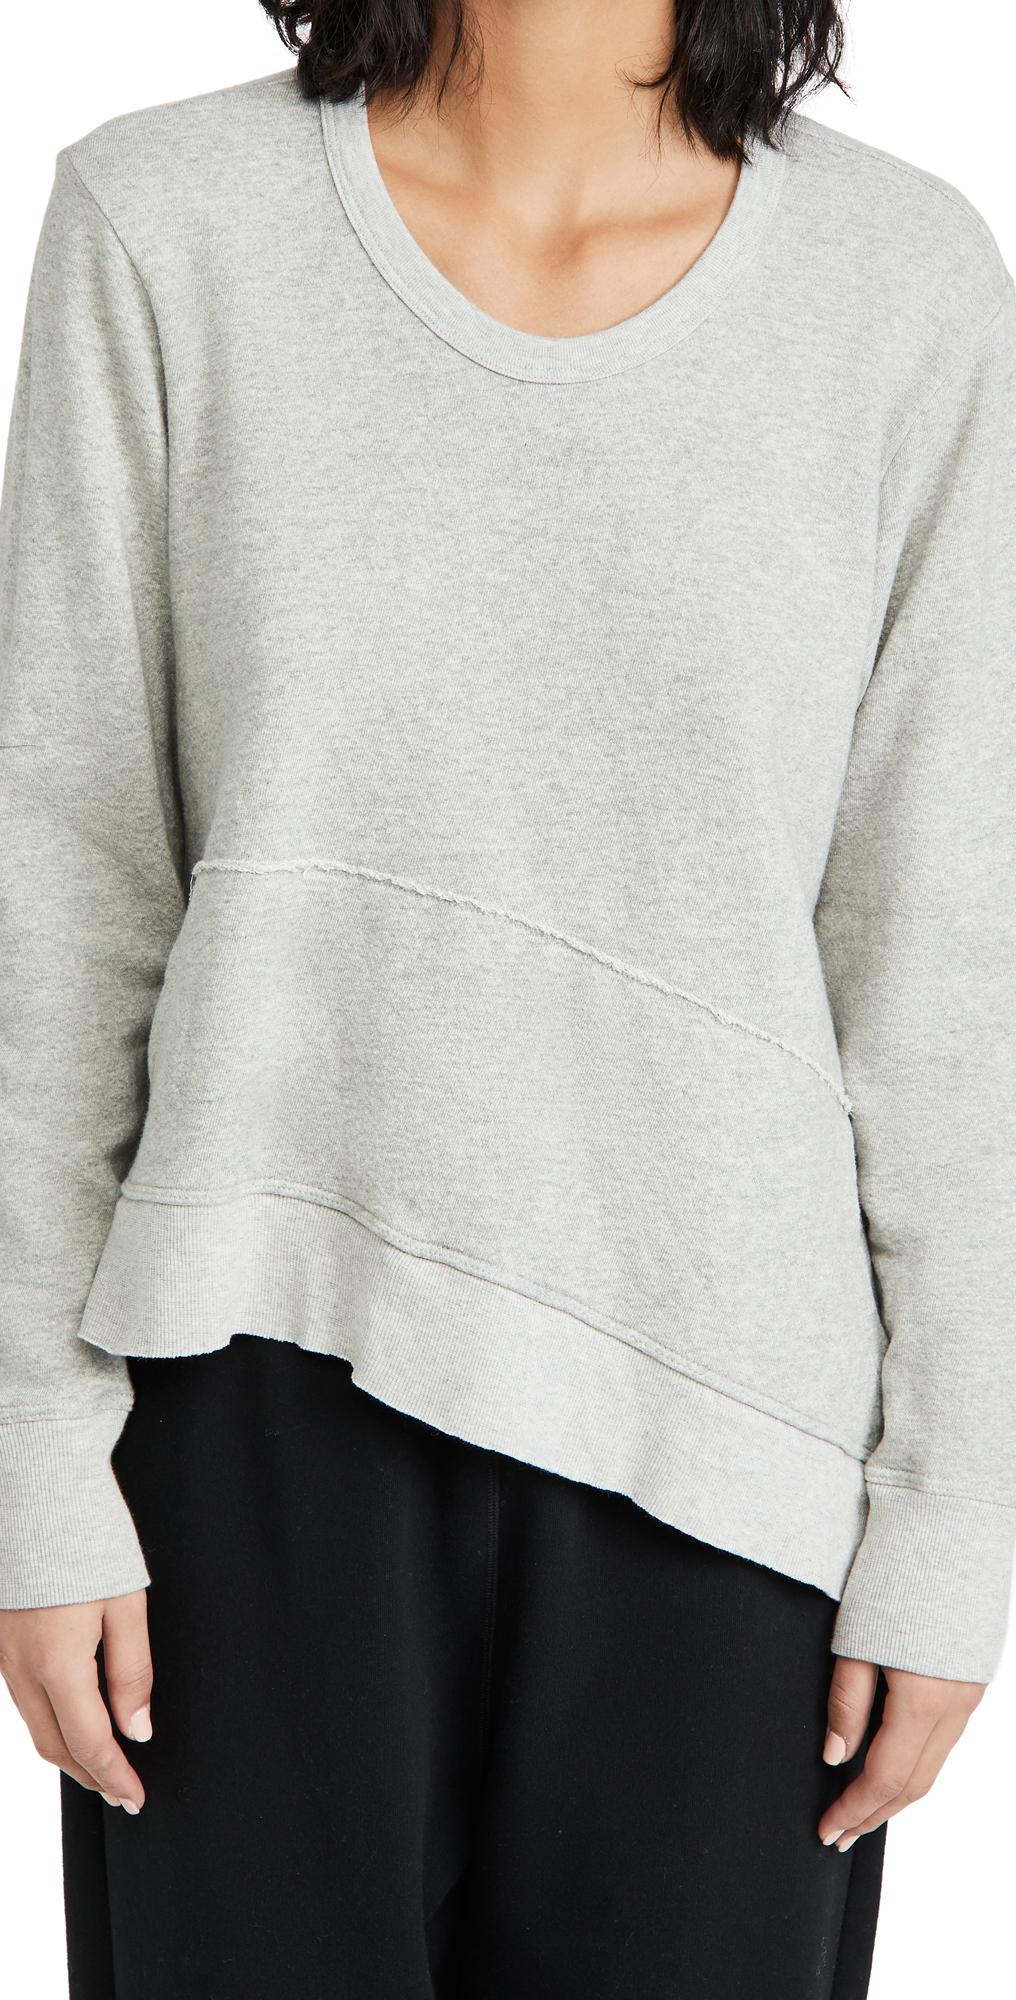 Wilt Slant Pocket Pullover